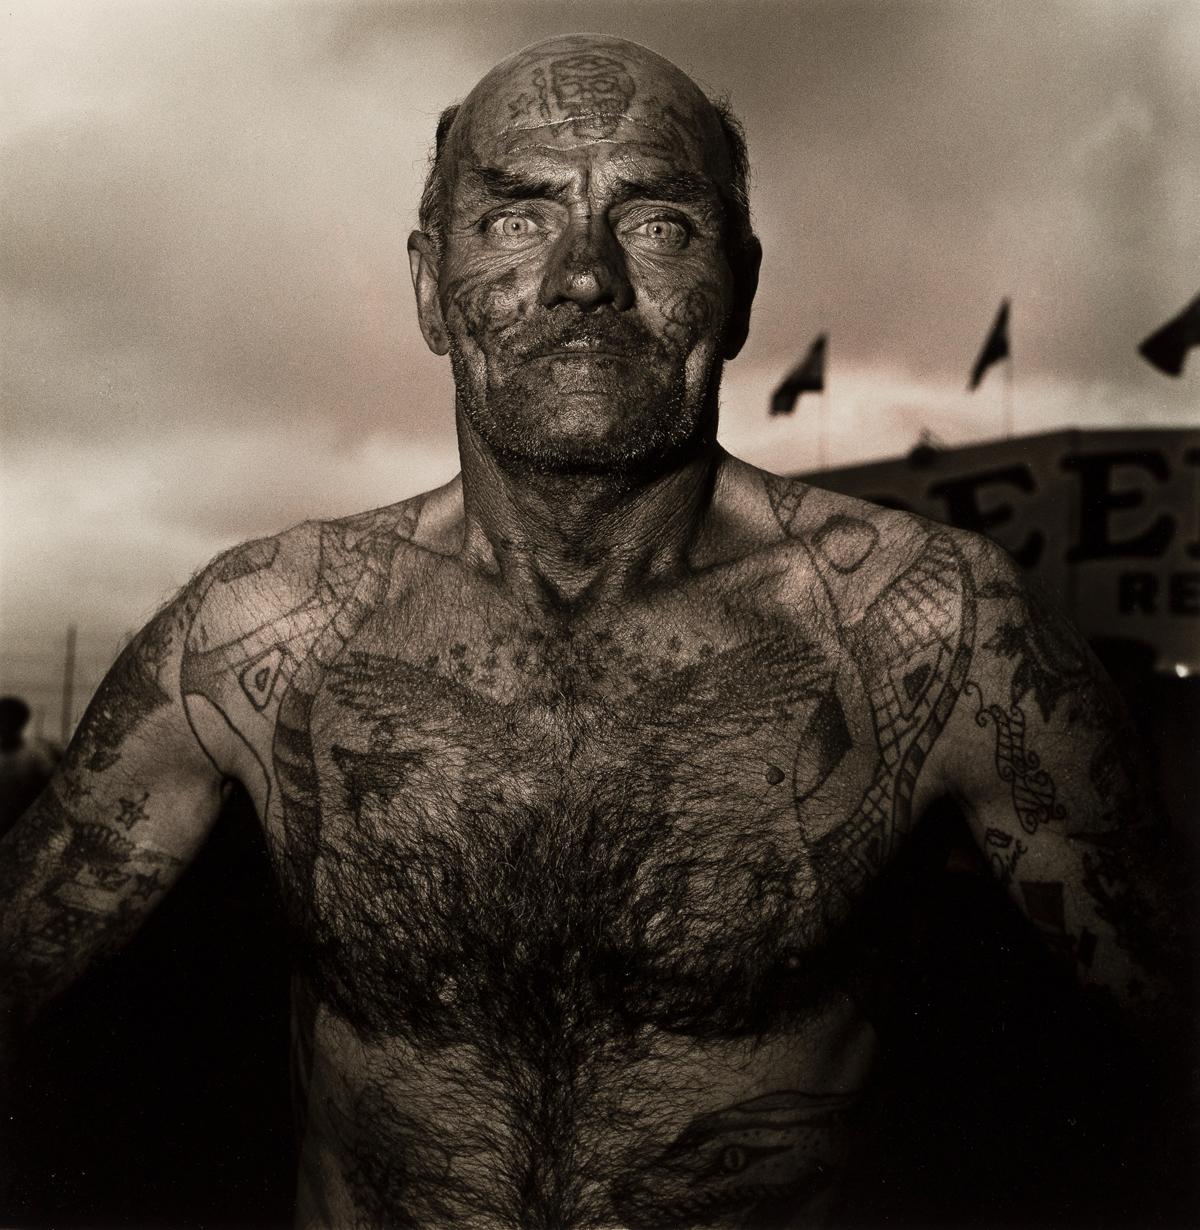 DIANE ARBUS (1923-1971)/NEIL SELKIRK (1947- ) Tattooed man at a Carnival, M.D.